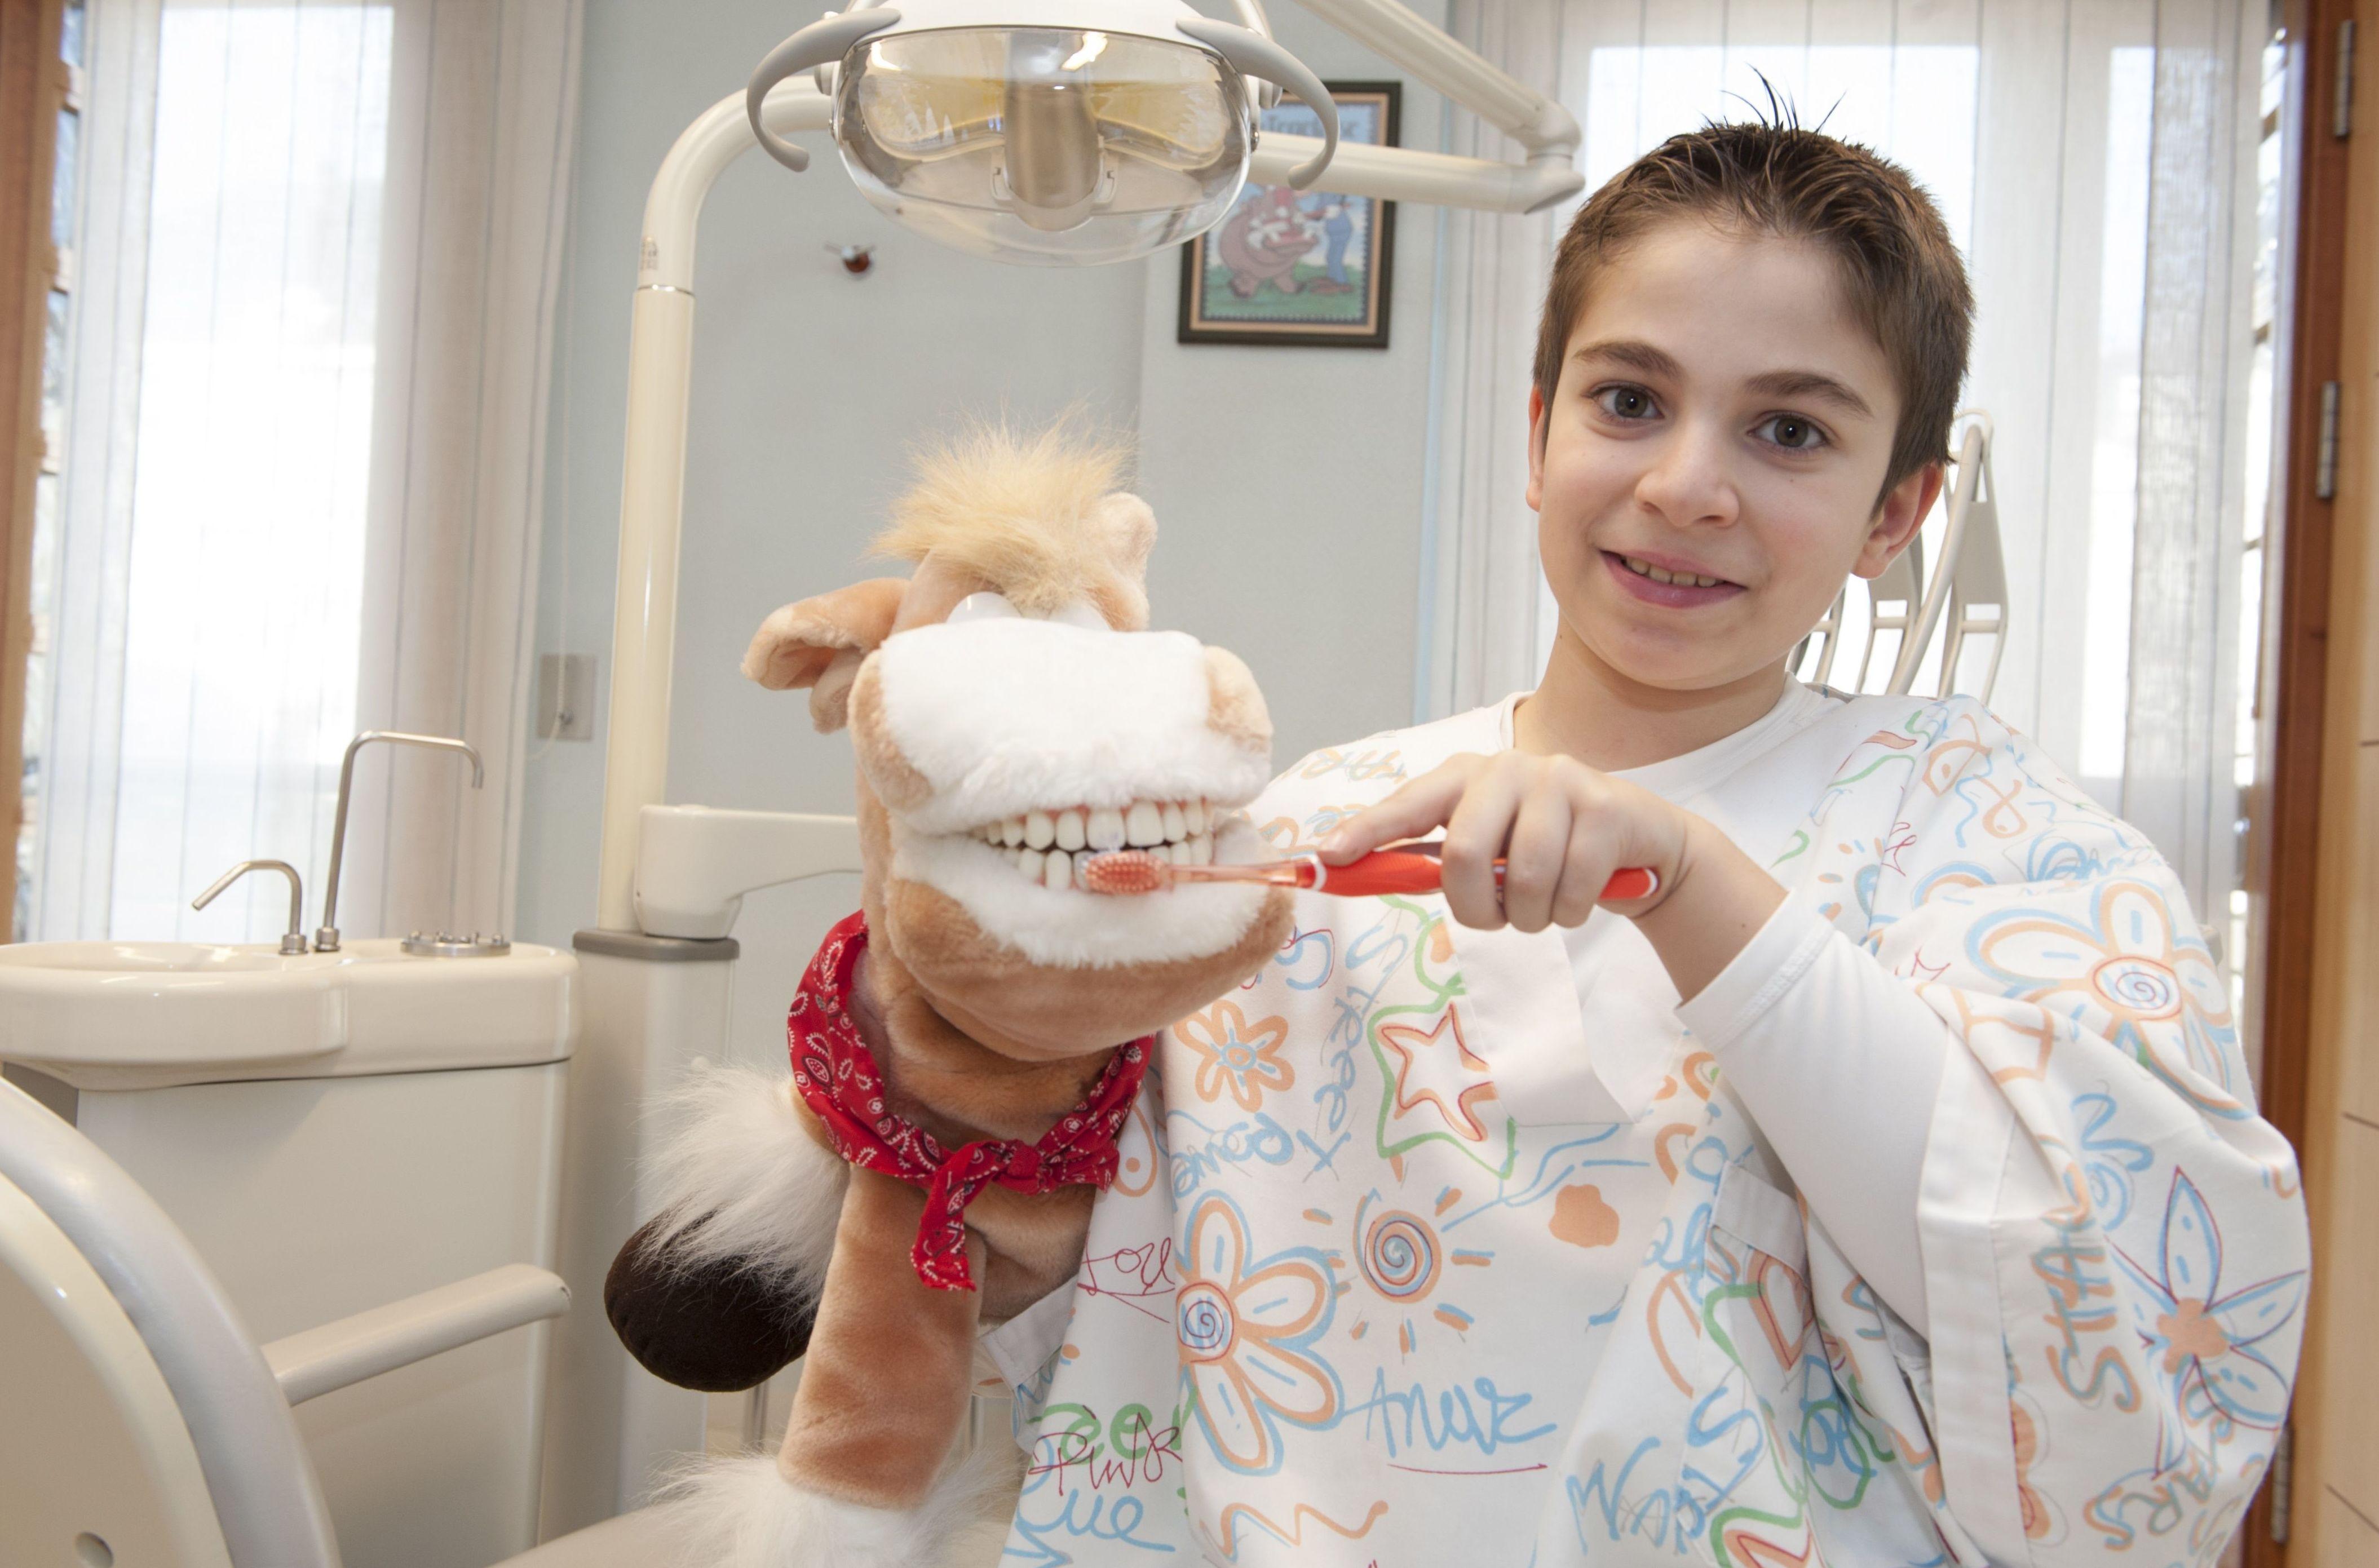 Blanqueamientos dentales en Ferrol